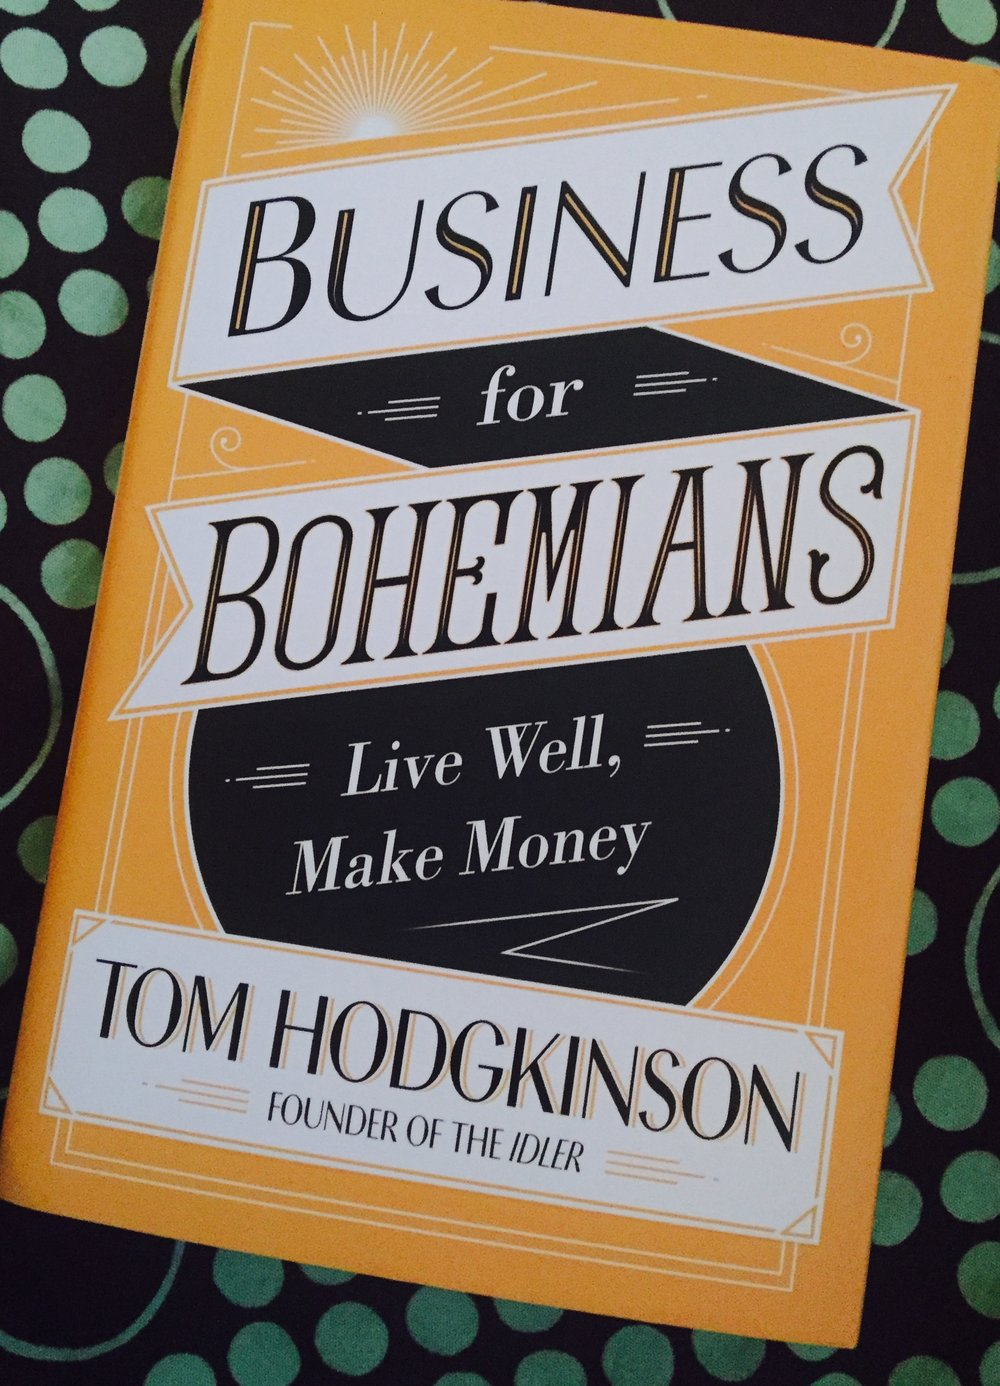 Not a boring read, thankfully!